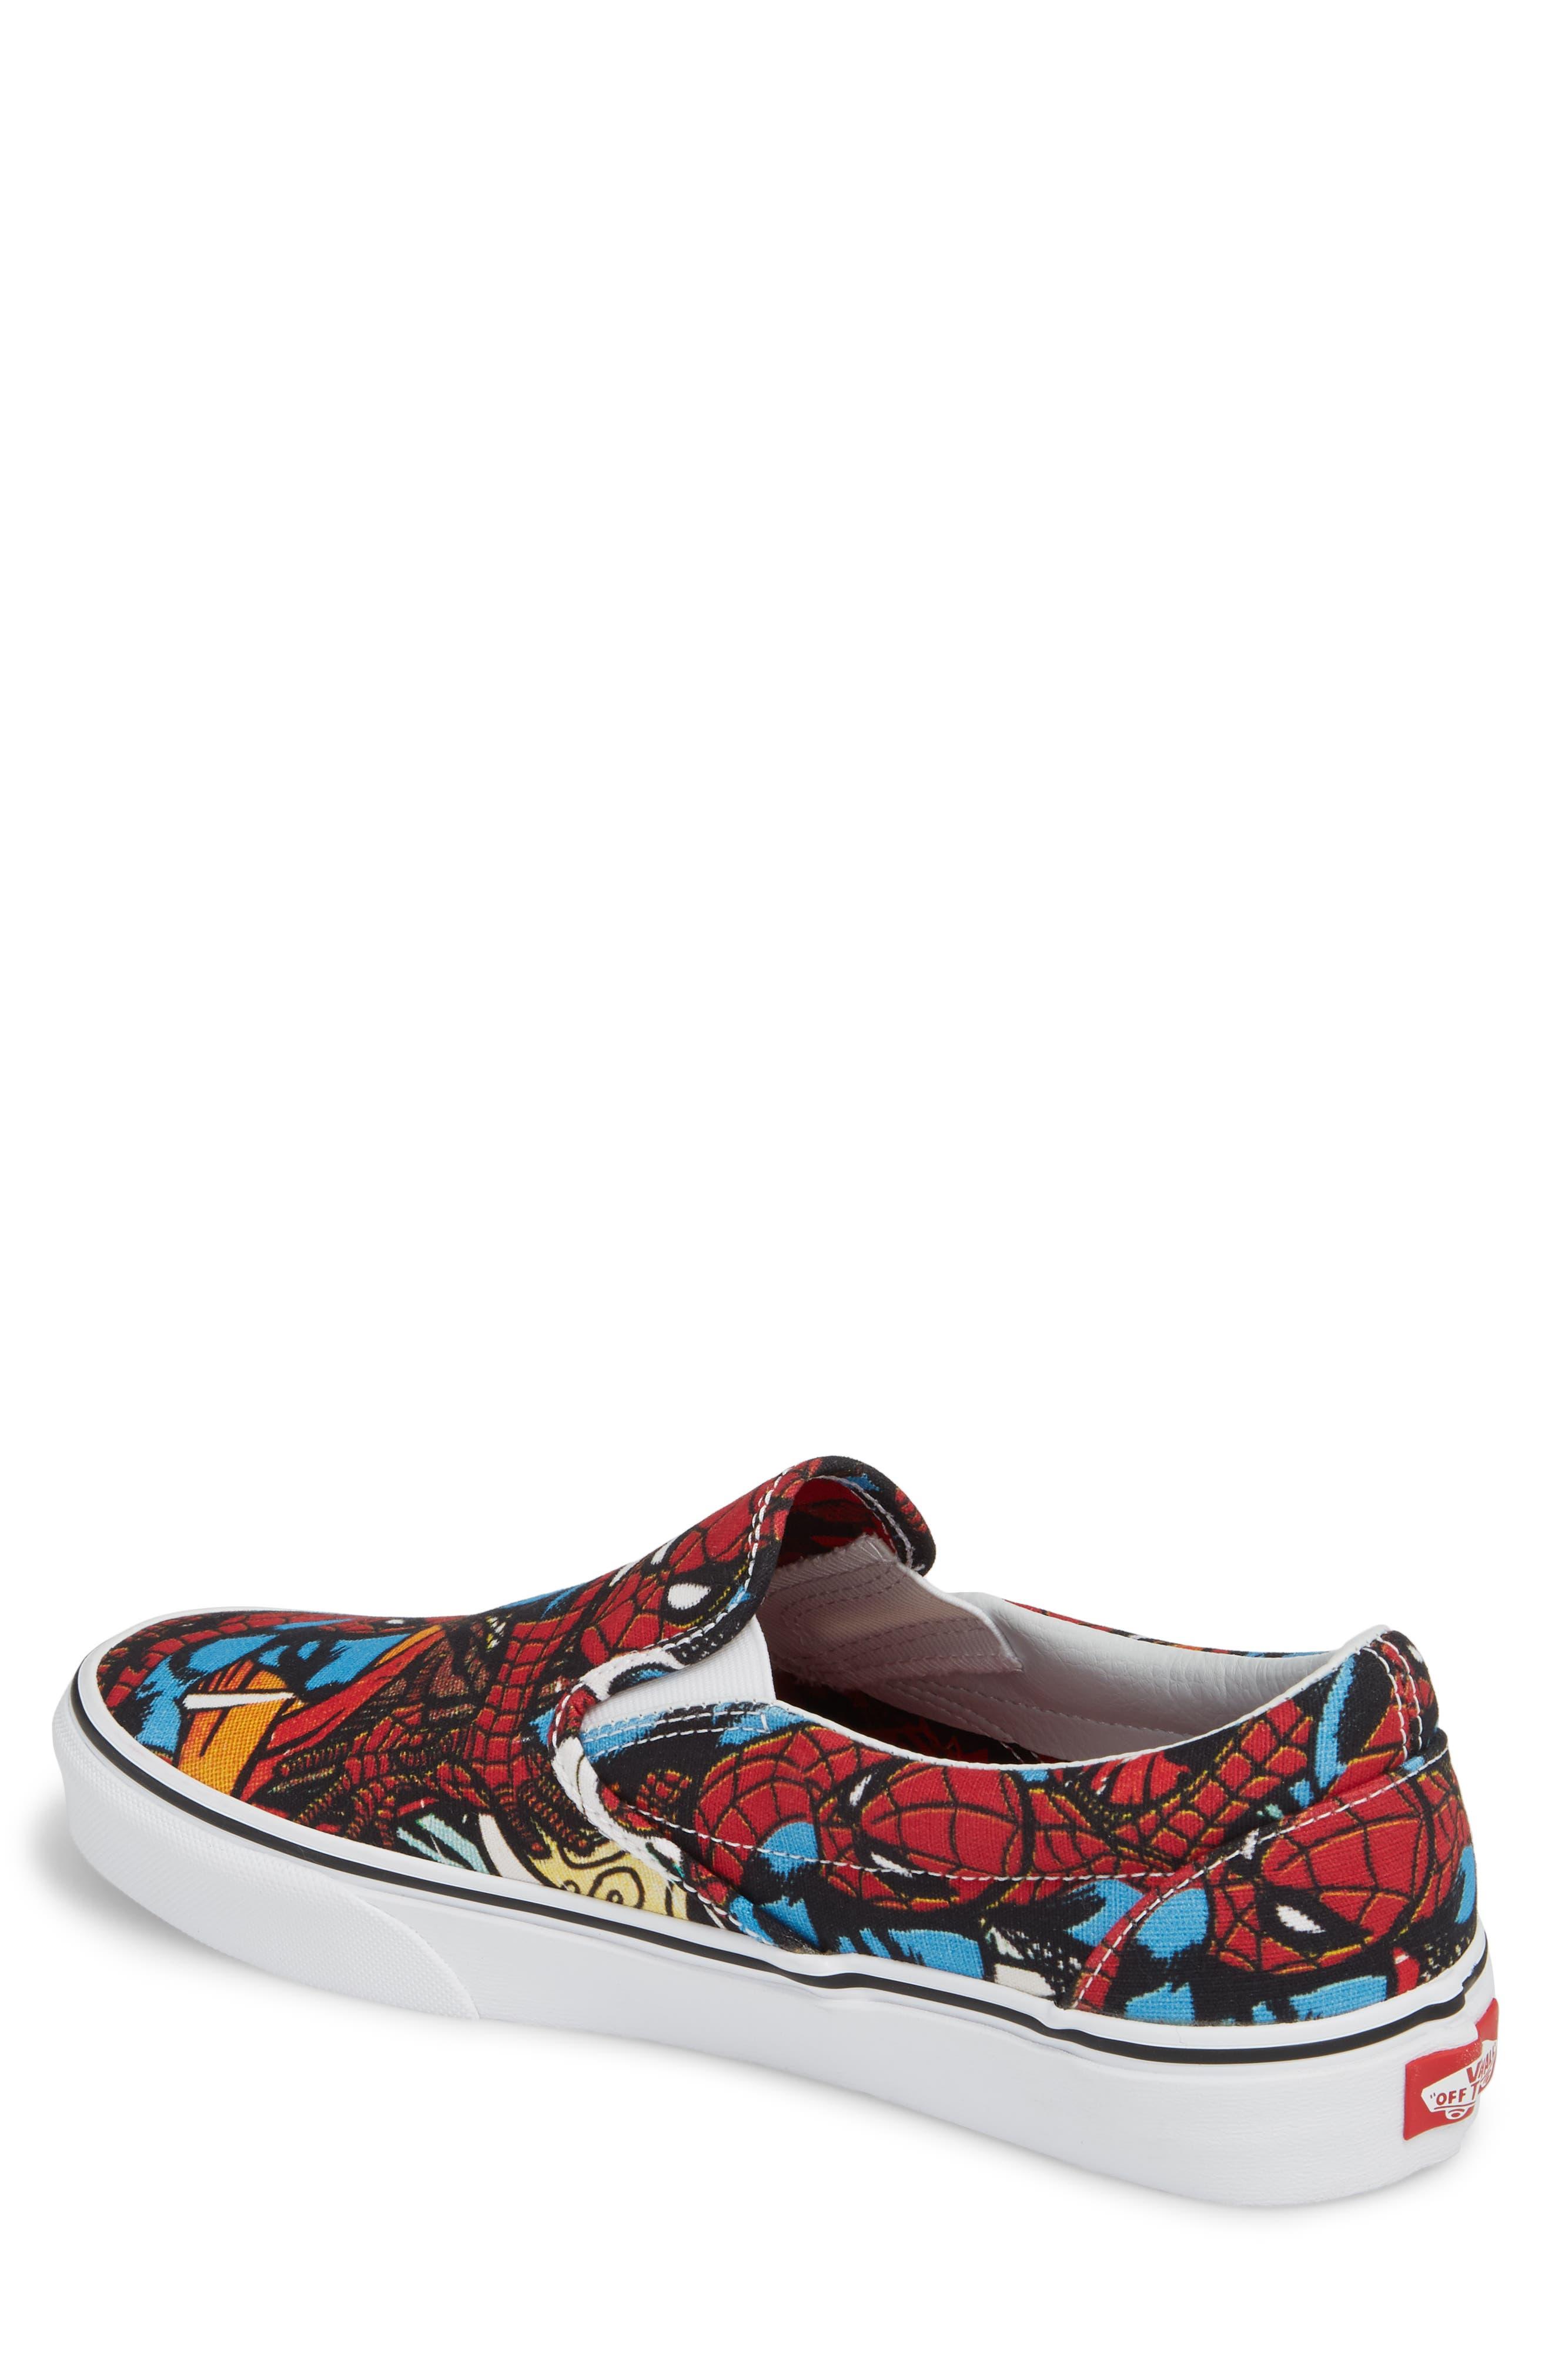 Marvel UA Classic Slip-On Sneaker,                             Alternate thumbnail 2, color,                             Black/ Red Textile